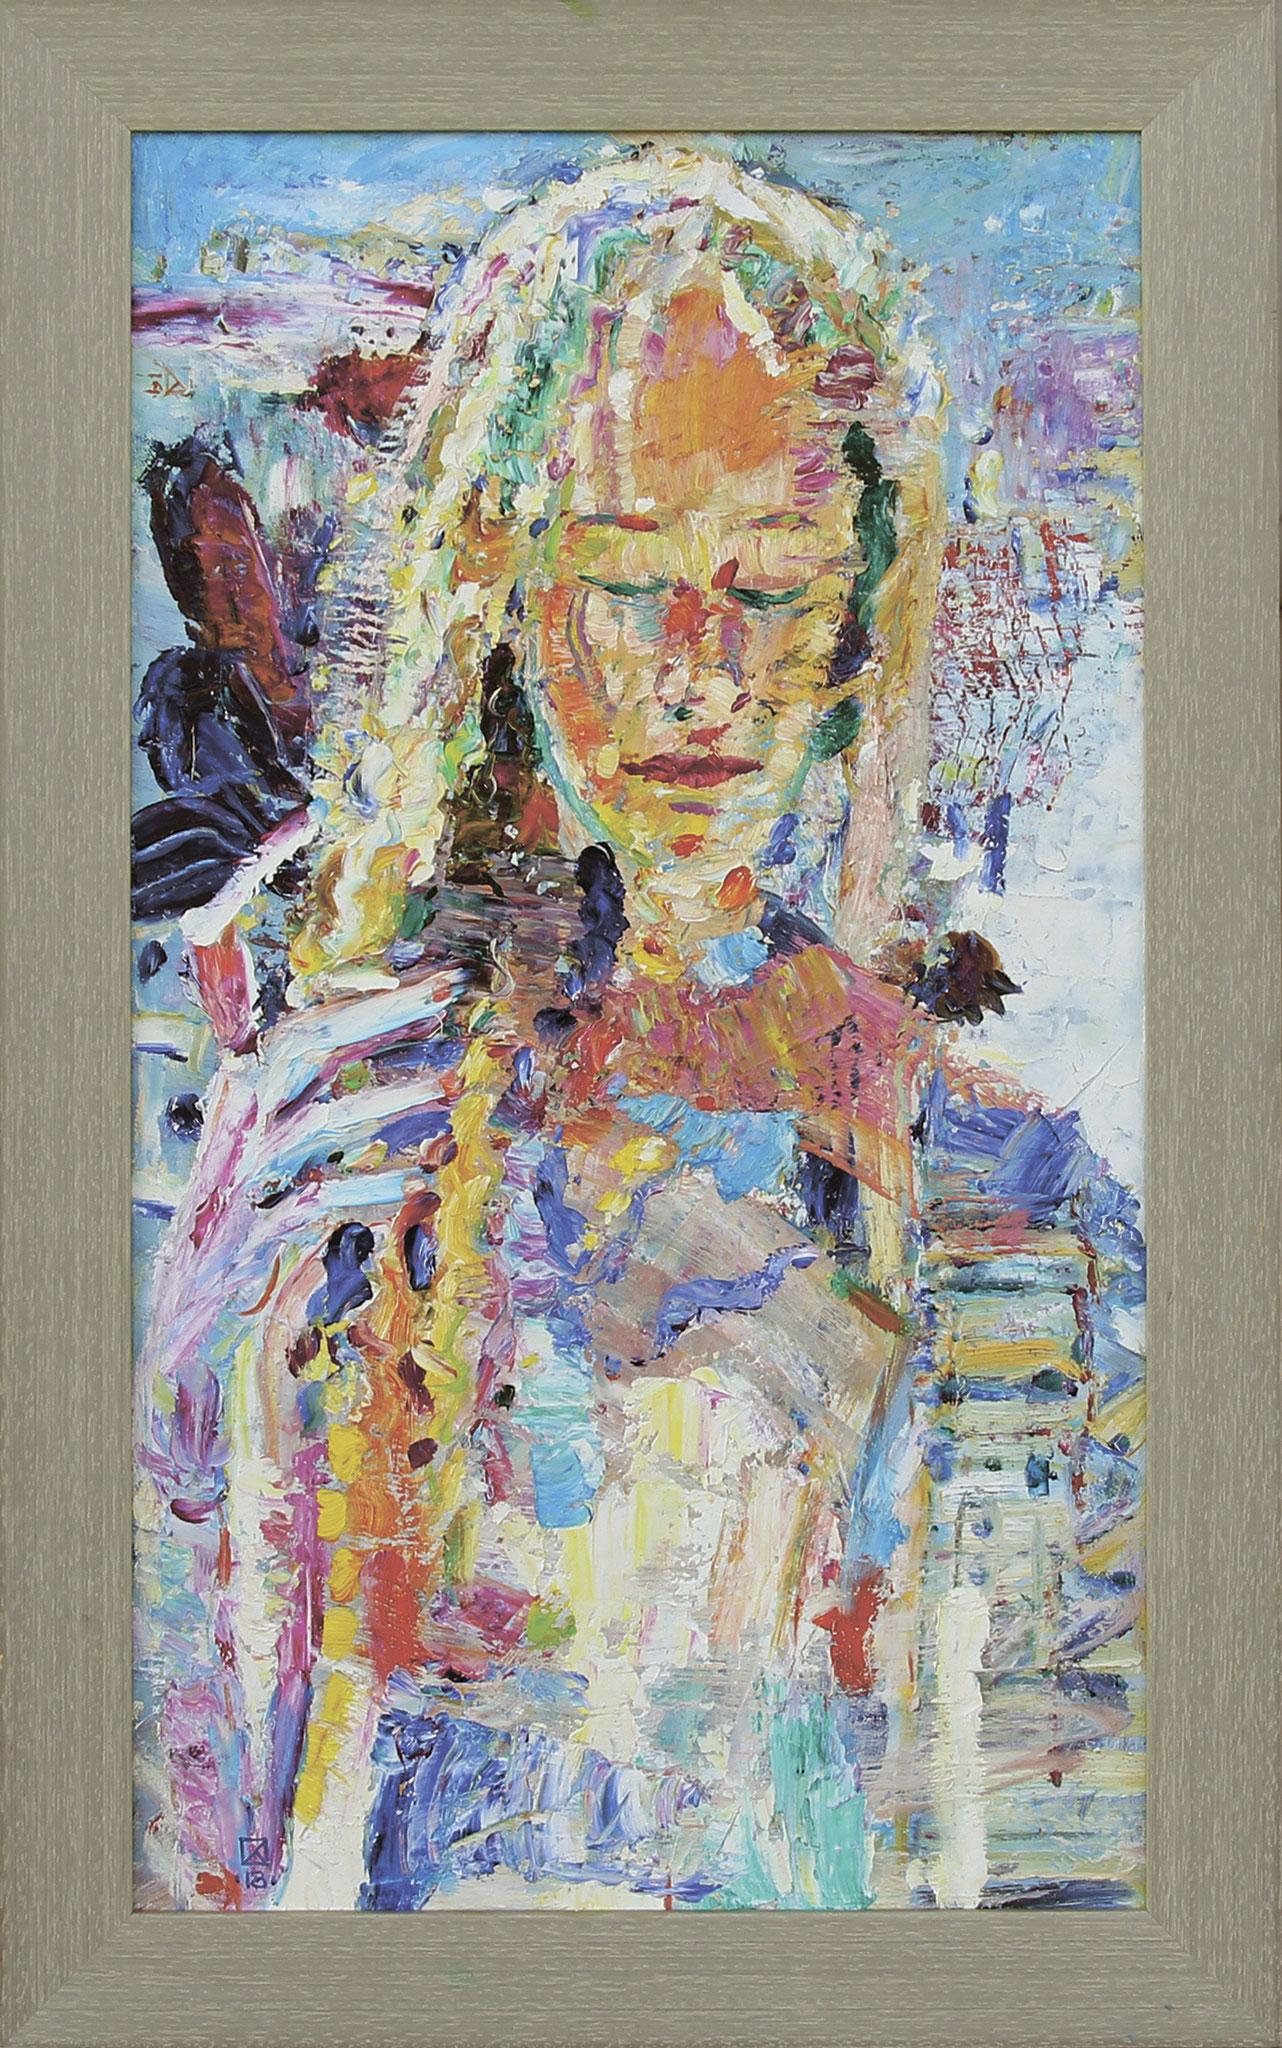 Vernal. 2018. Oil on canvas, cardboard. 66 х 38